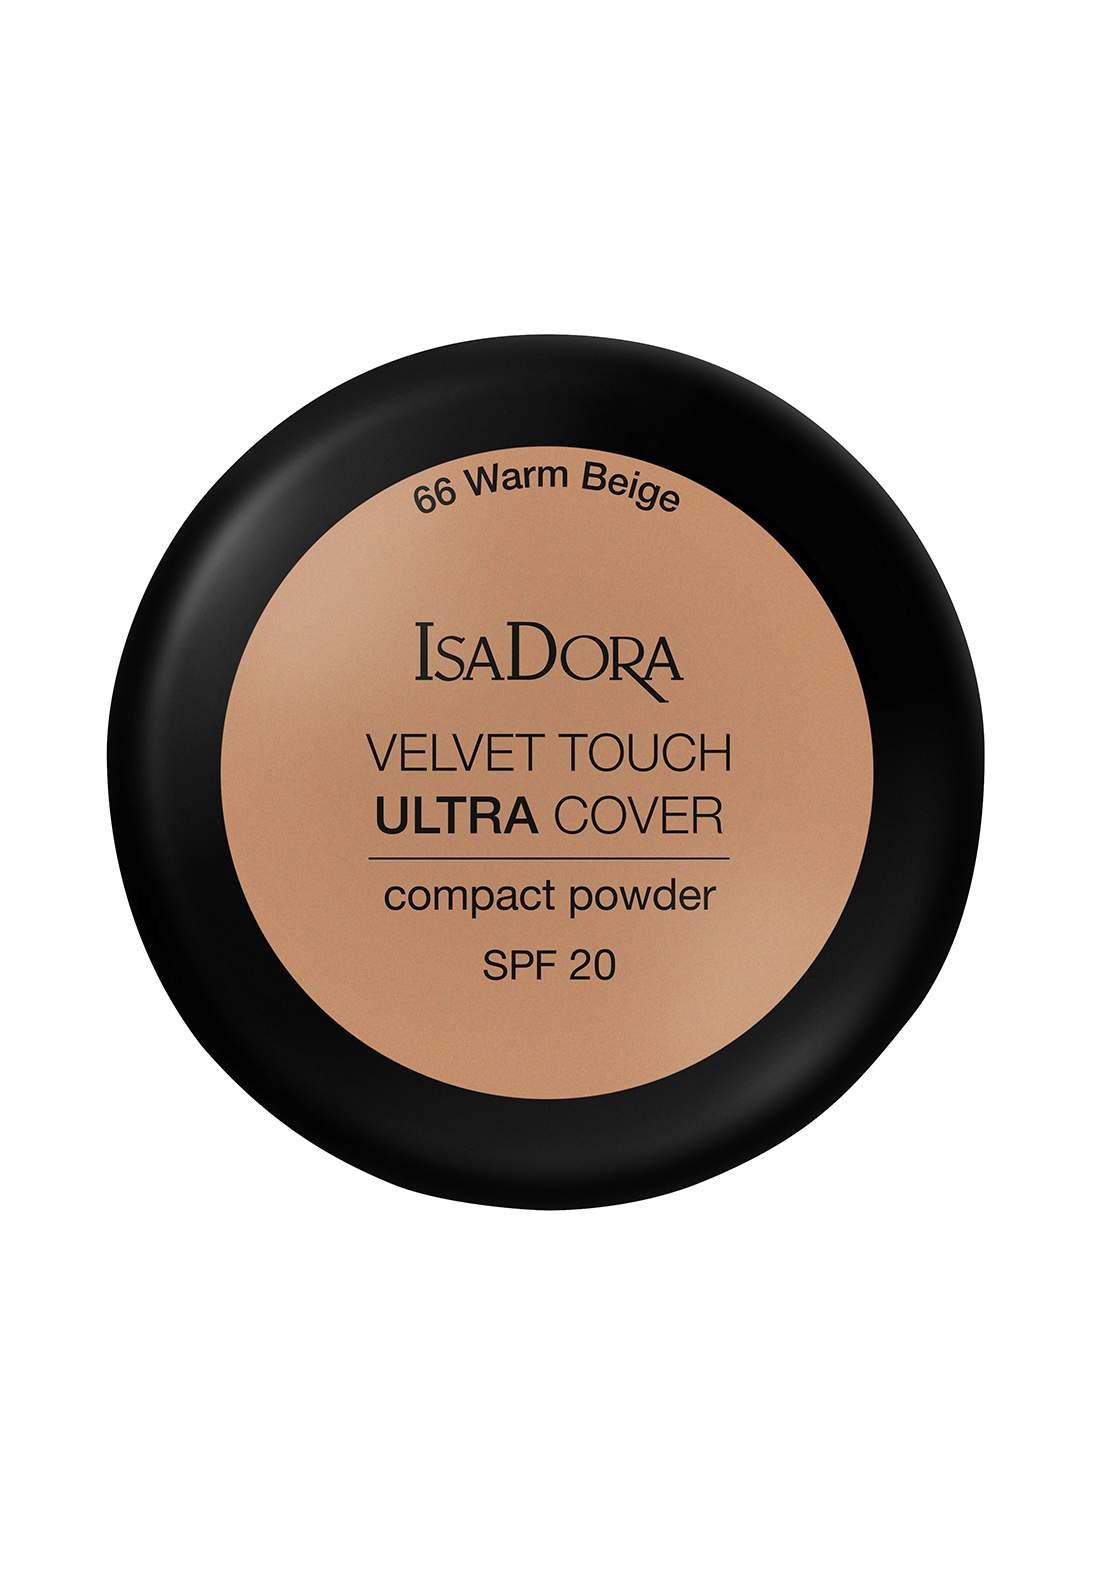 IsaDora 317114 Velvet Touch Sheer Cover Compact Powder Warm Beige SPF 20 NO.66 بودرة